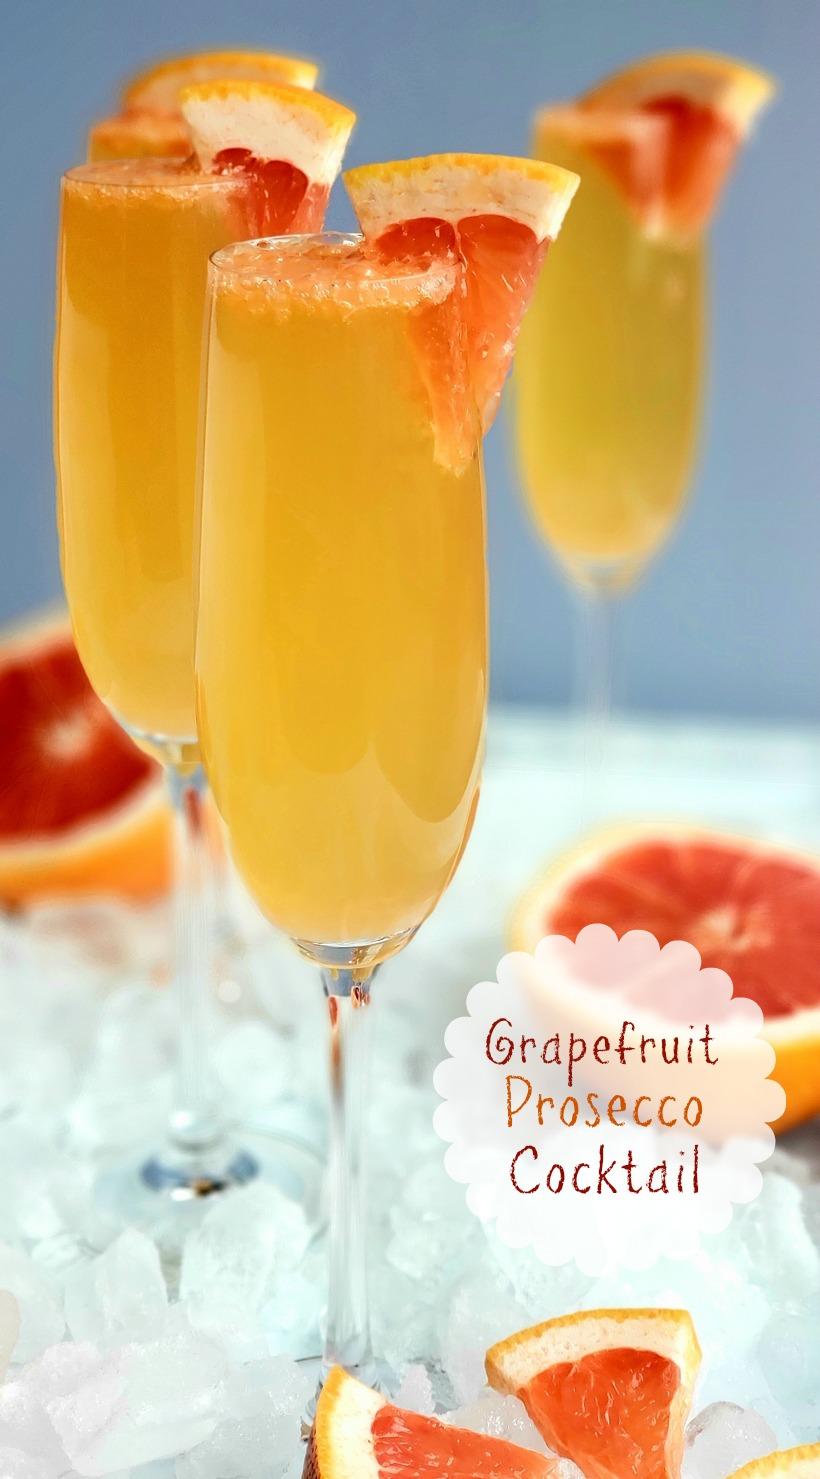 Grapefruit Prosecco Cocktails